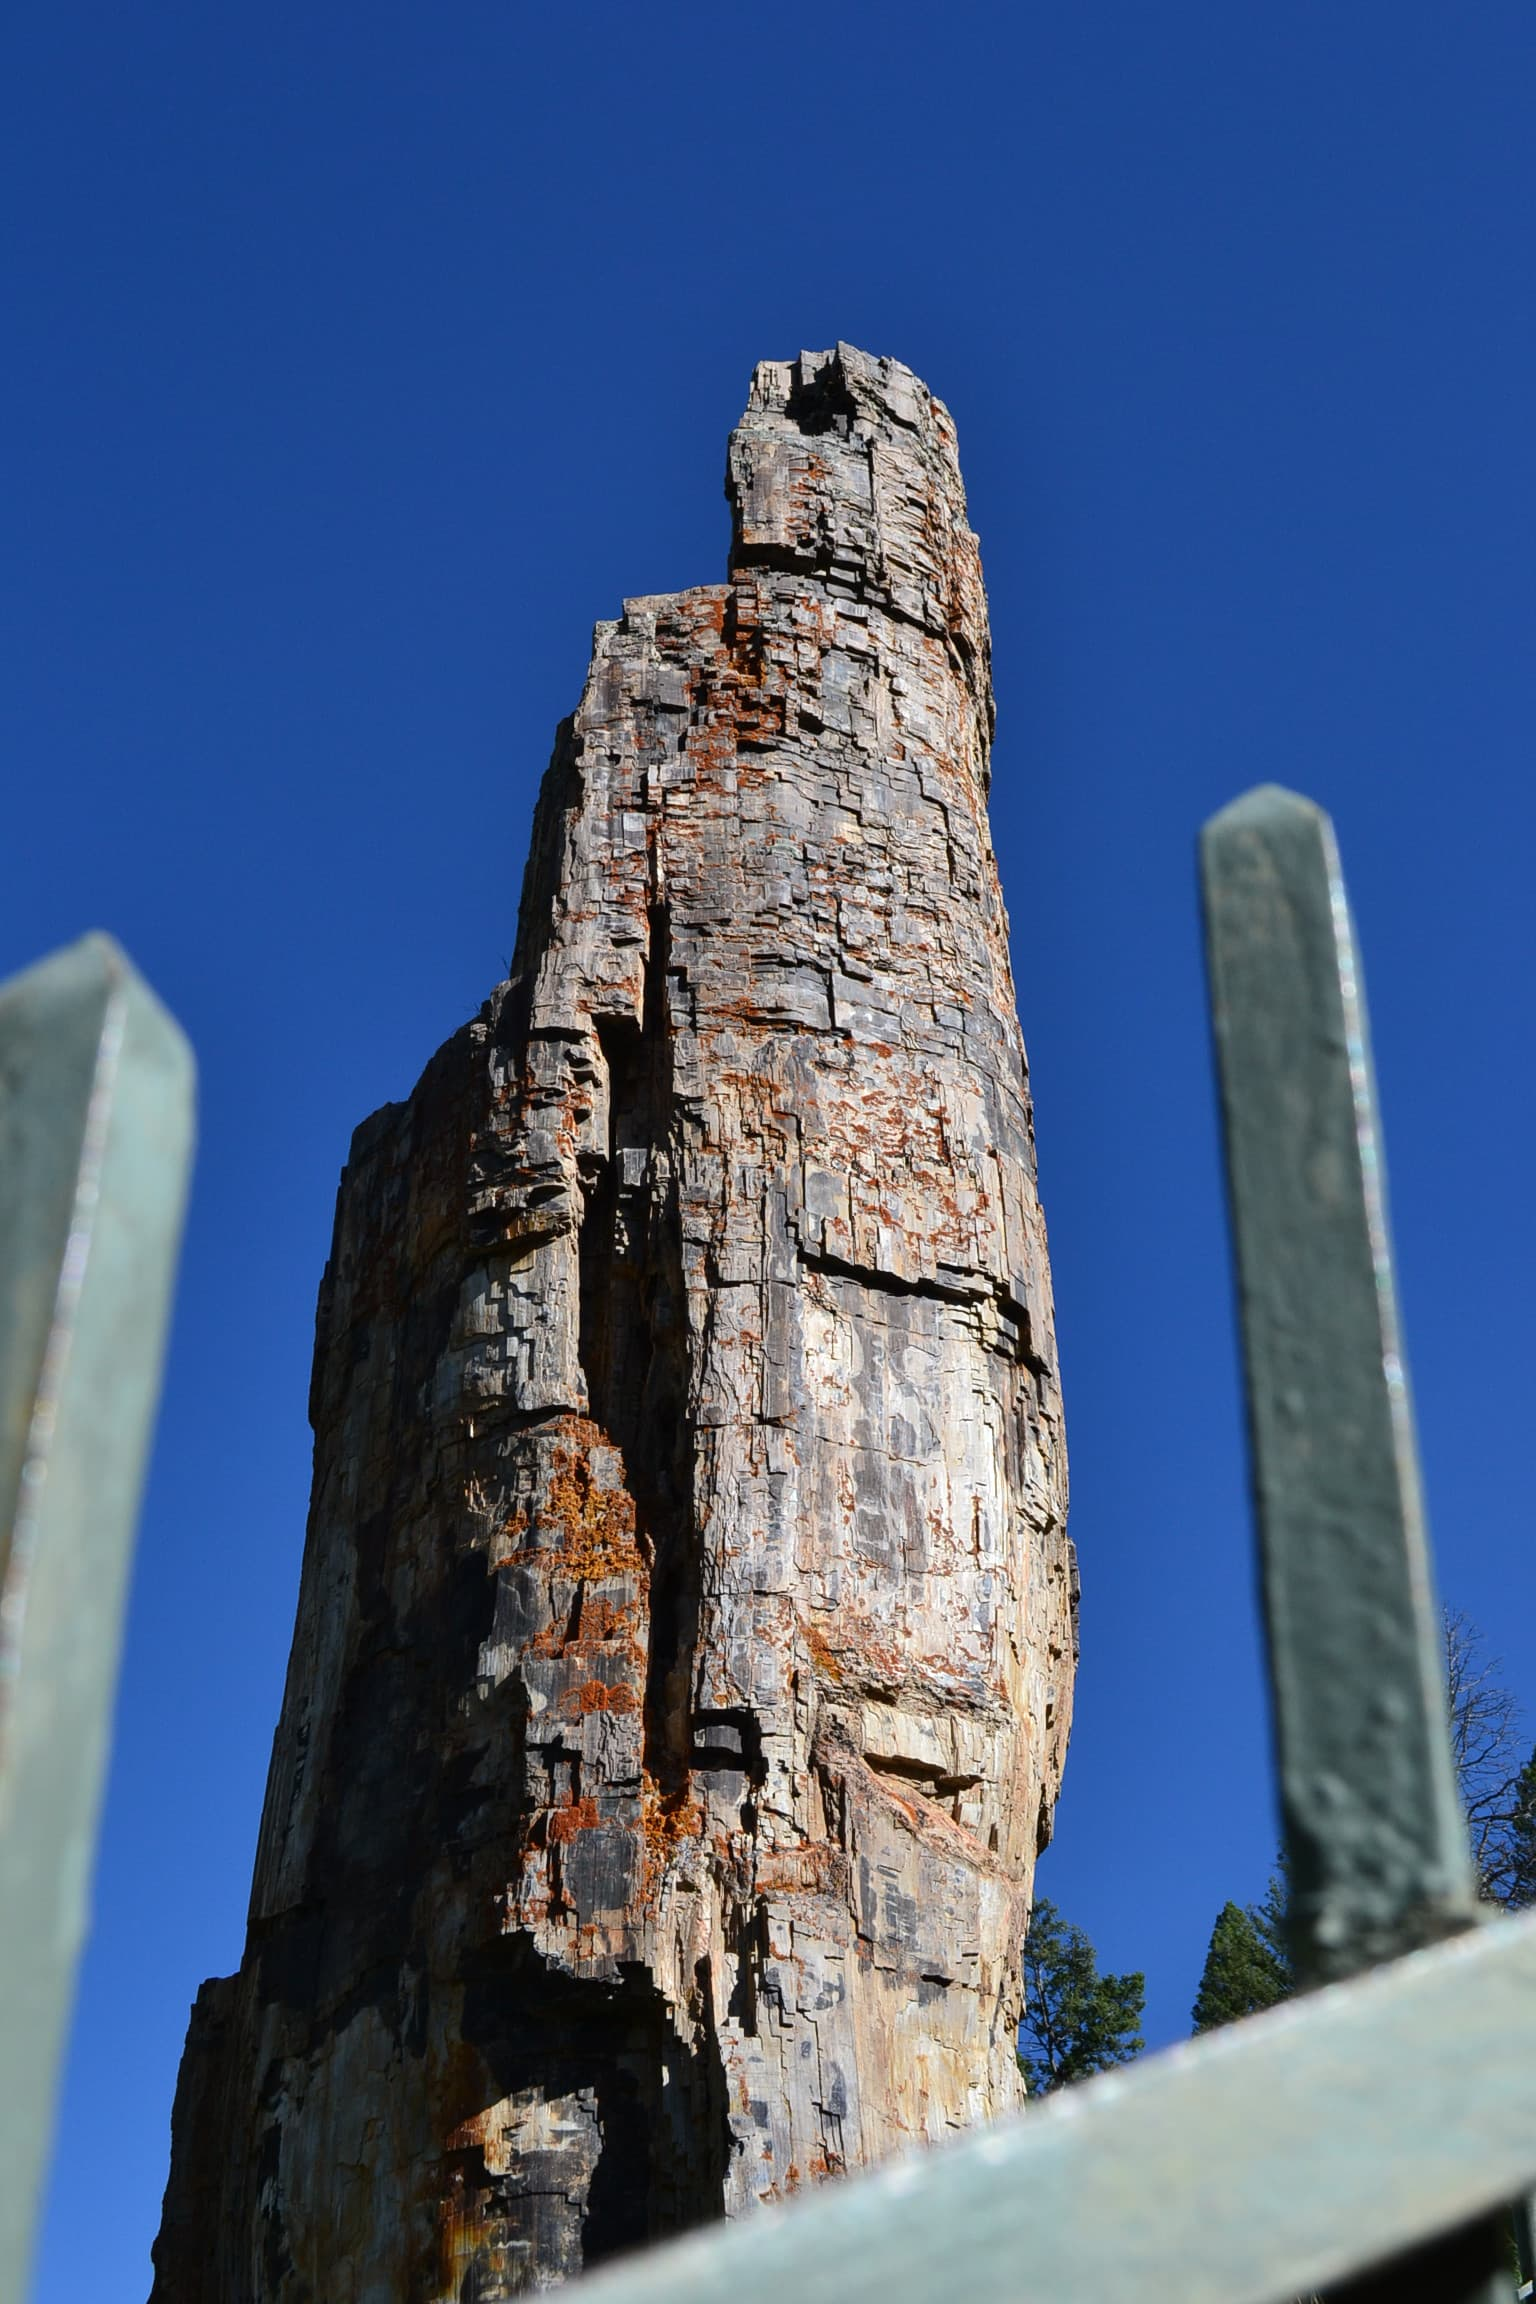 Closeup view of a standing petrified tree.